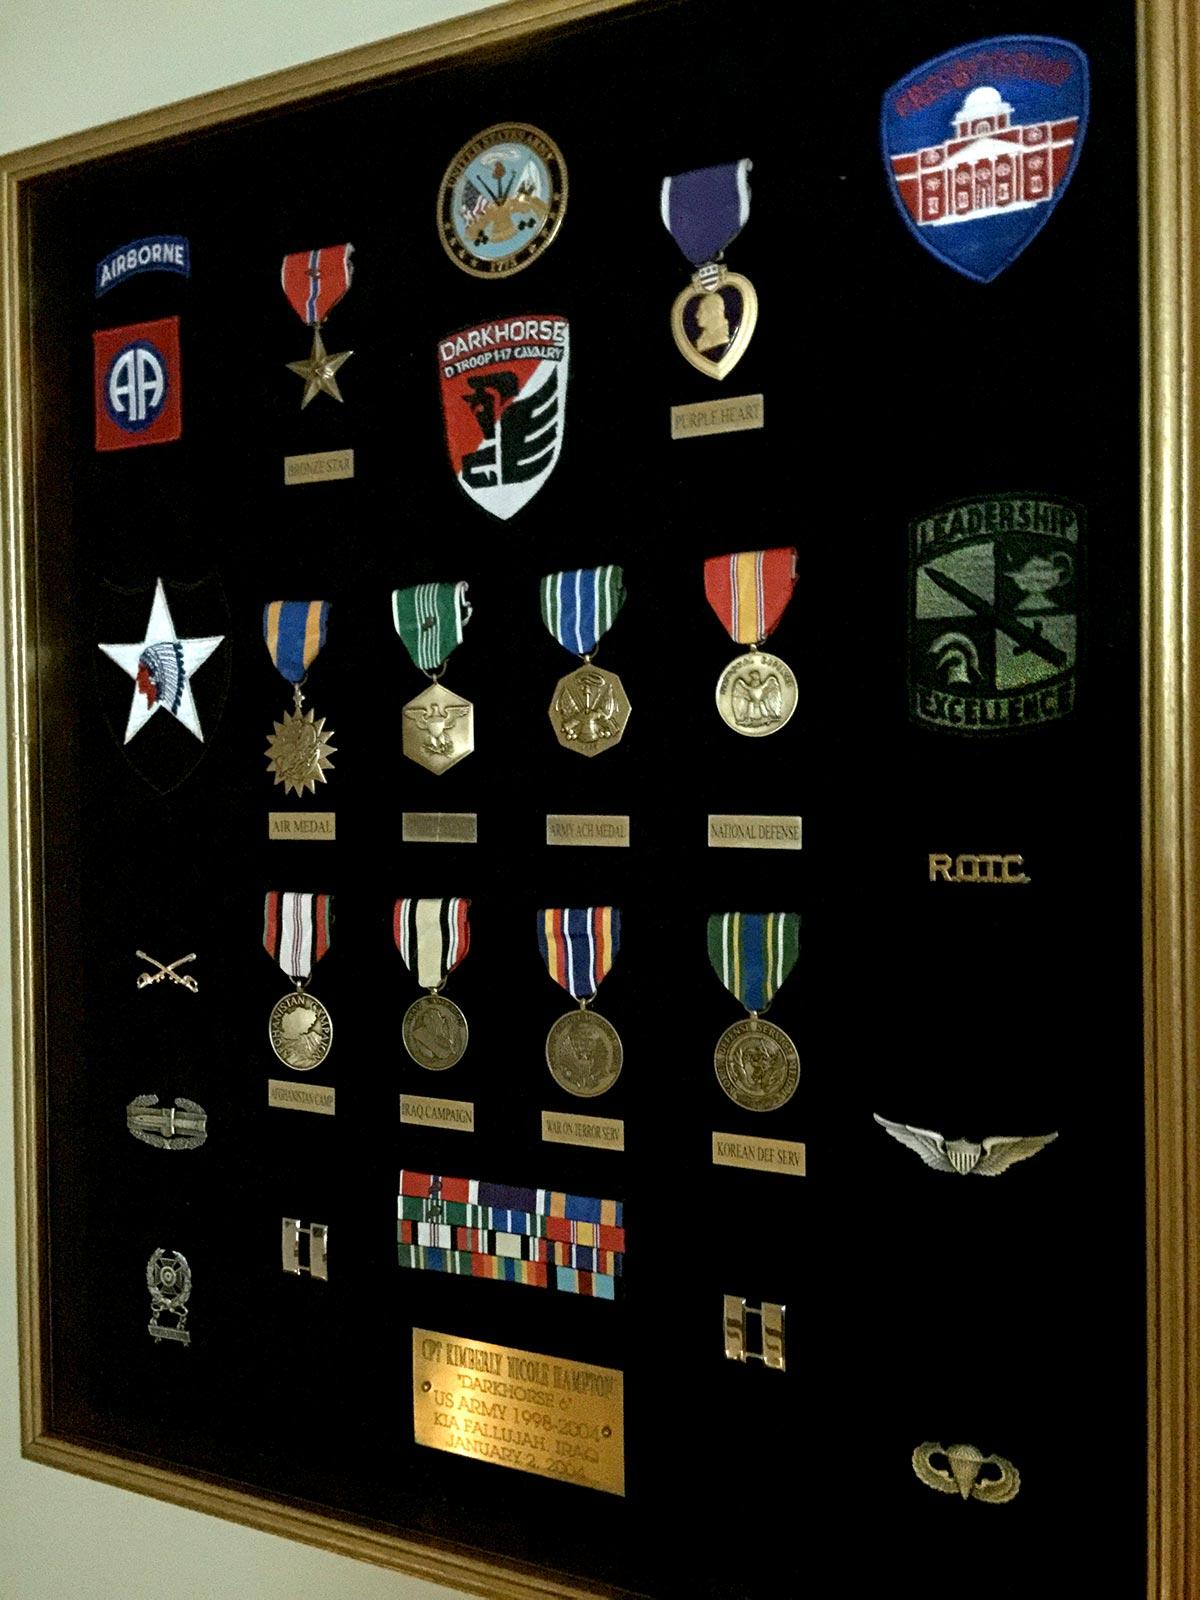 Captain Kimberly Hampton Awards and Decorations